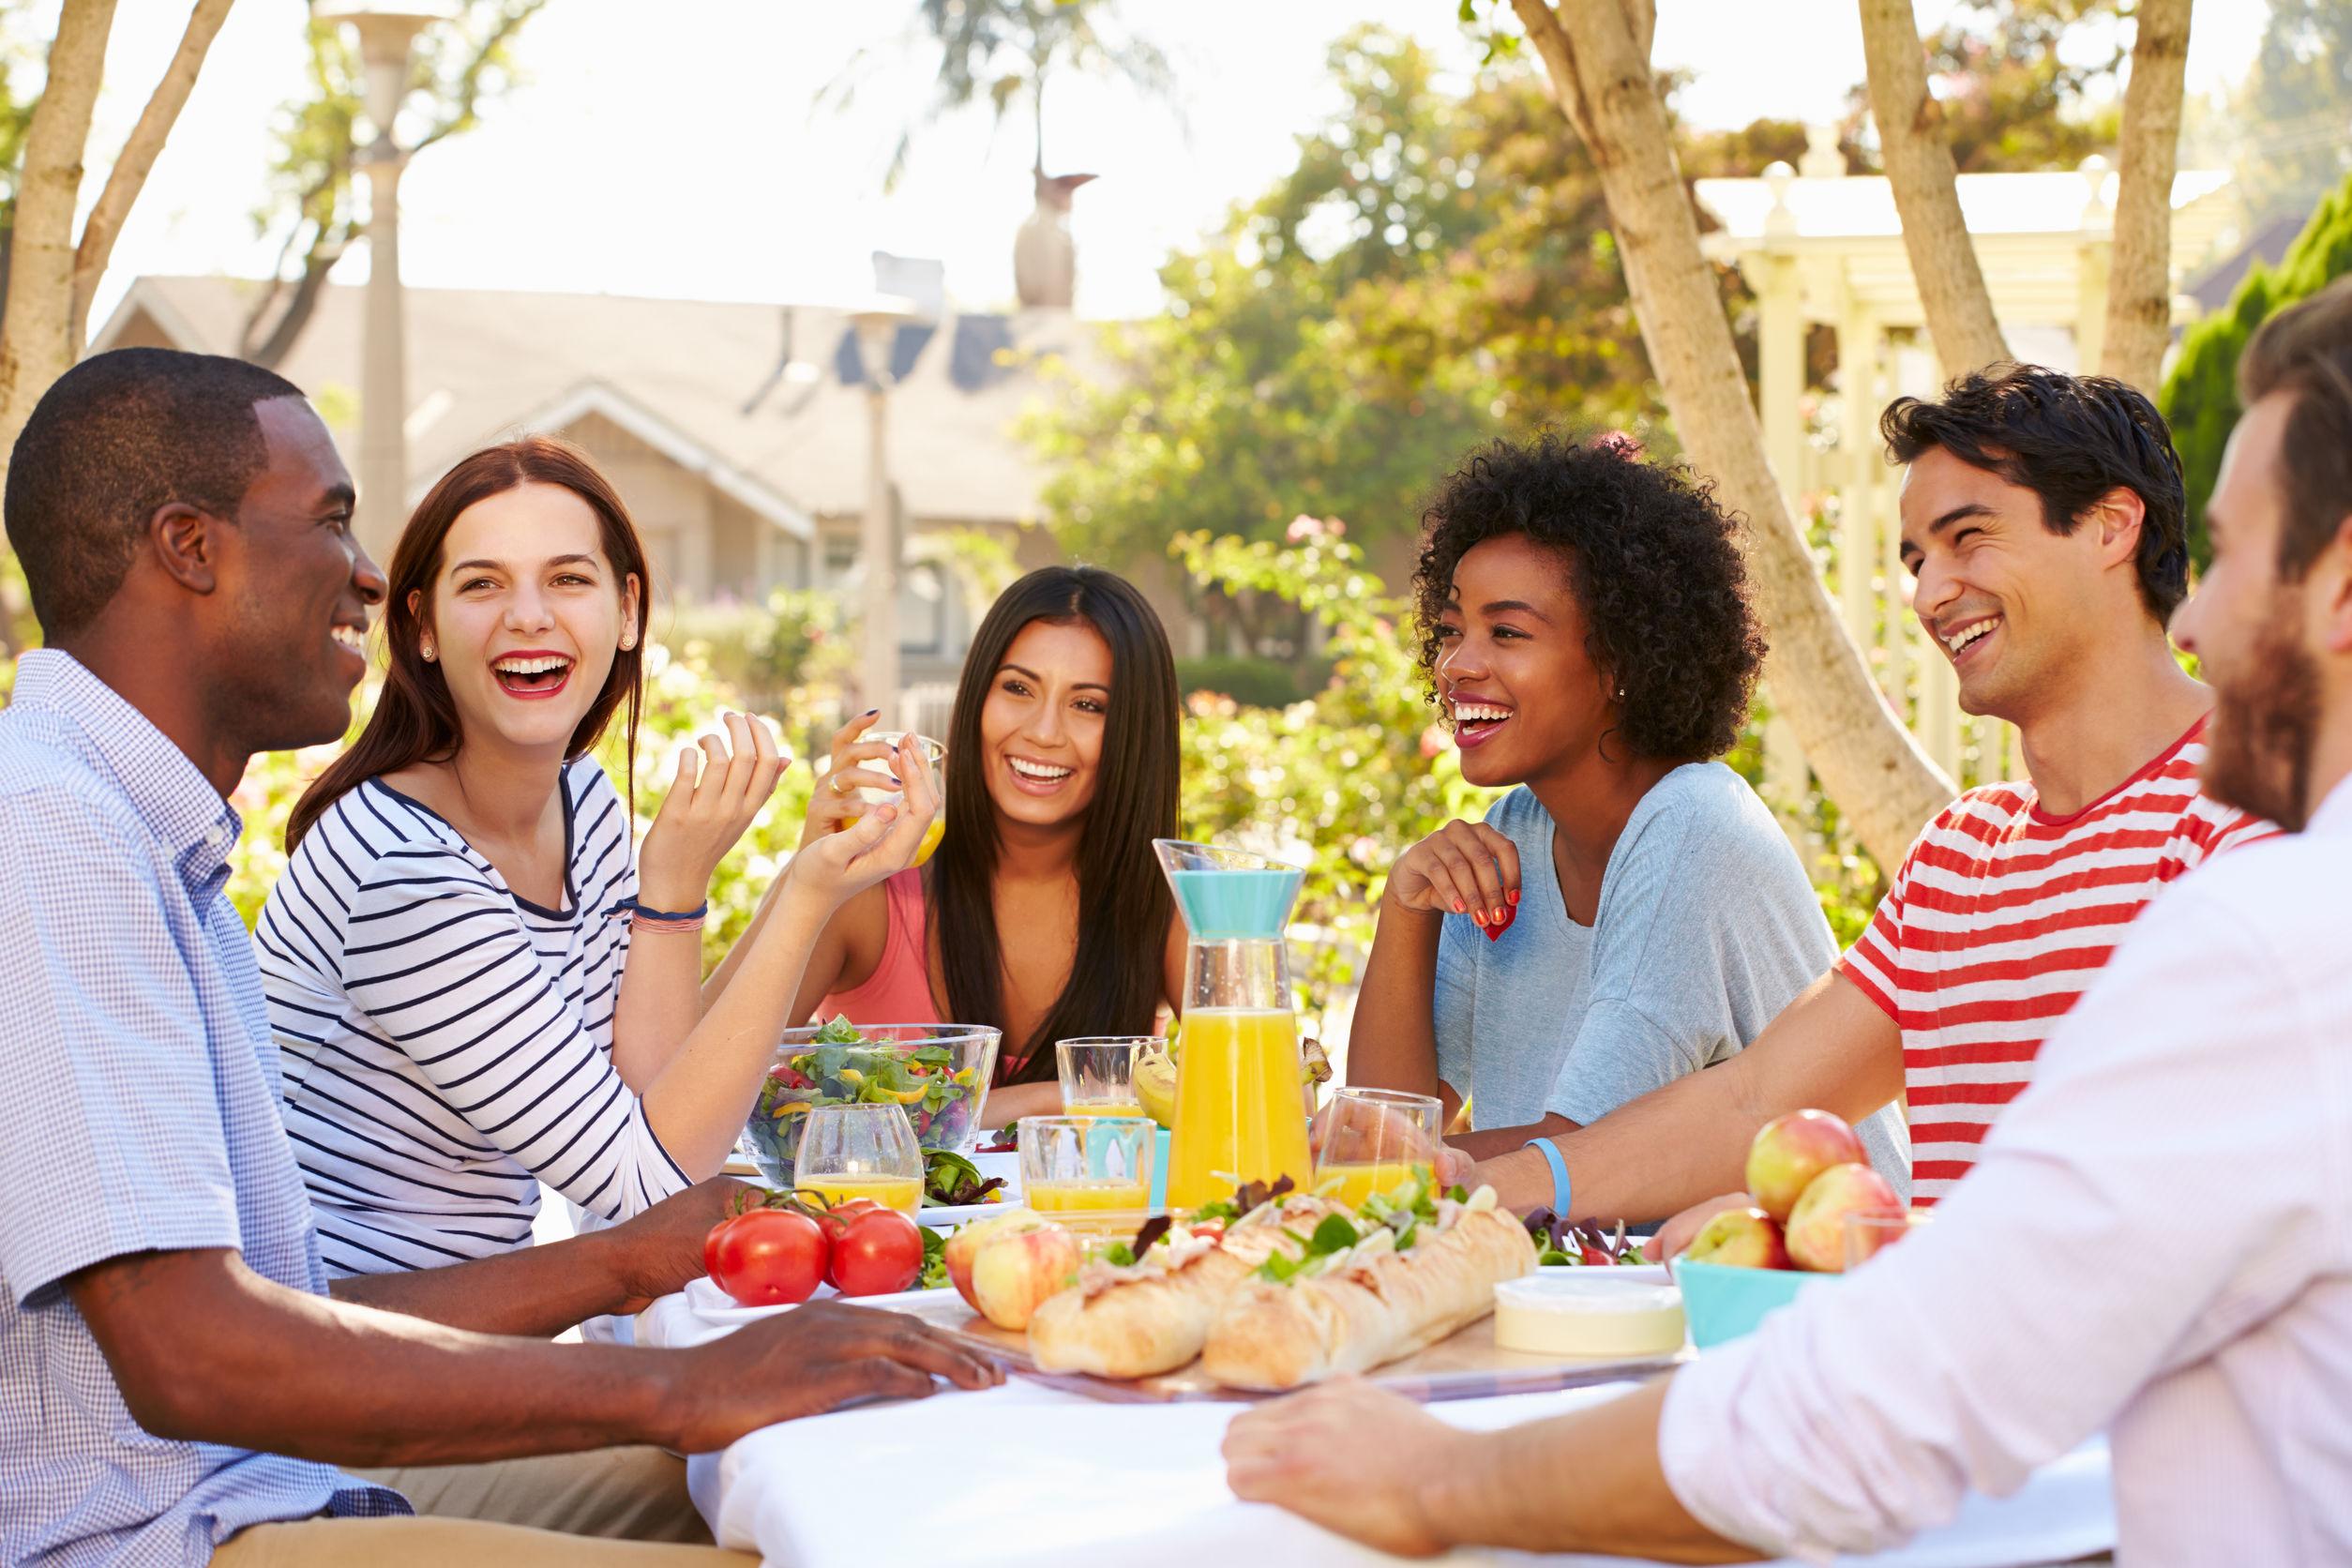 5 Outdoor Entertaining Tips